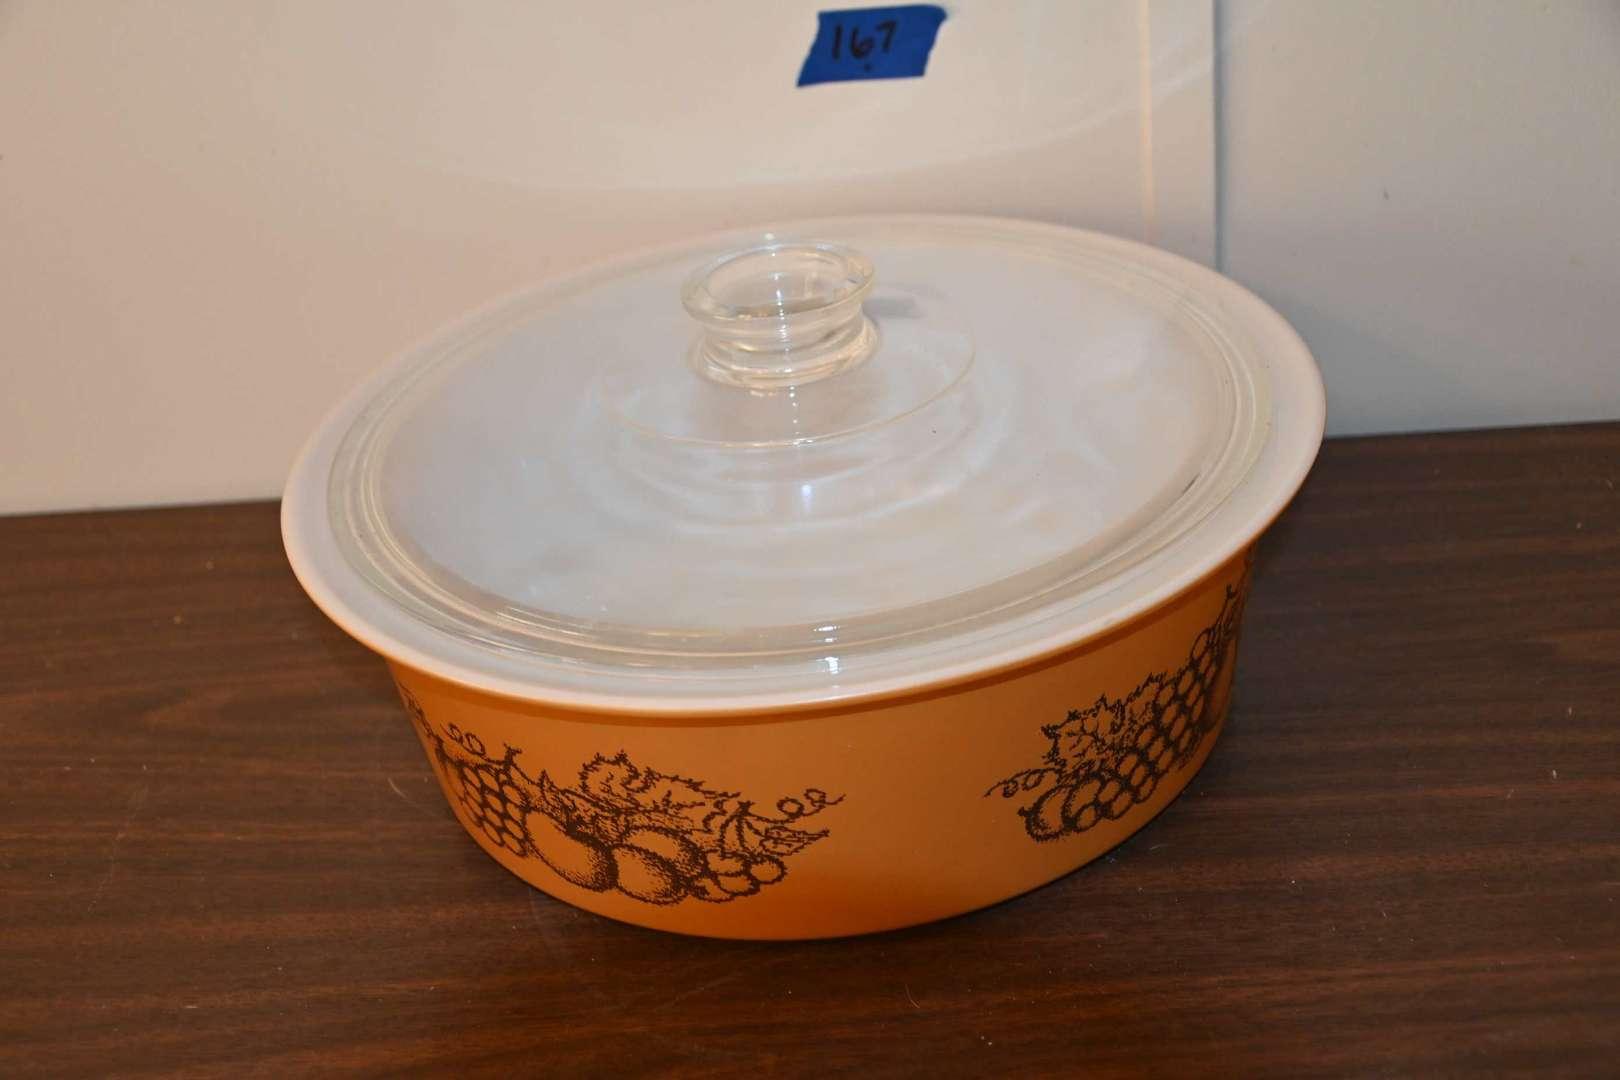 Lot # 167 Vintage PYREX BIG BERTHA 664 4 quart round casserole with lid